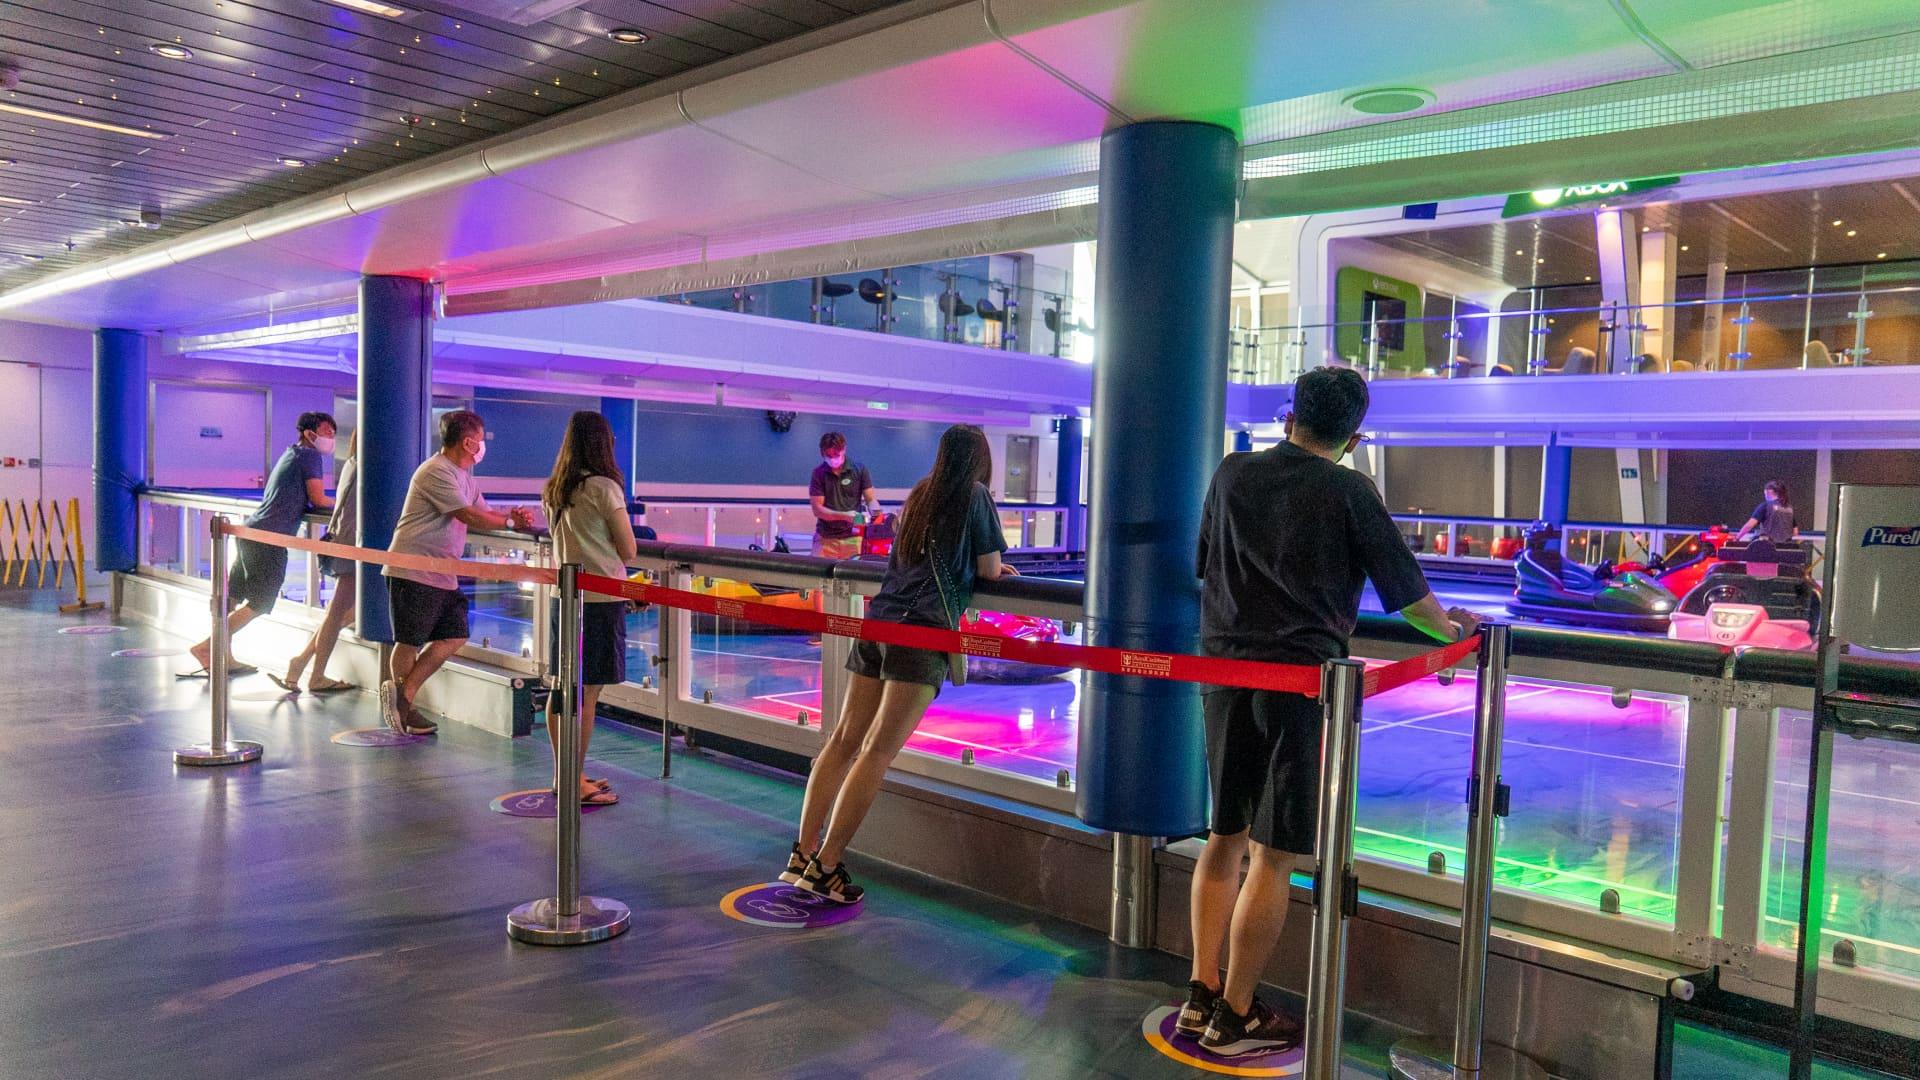 A socially distanced cruise activity on Royal Caribbean's Odyssey of the Seas